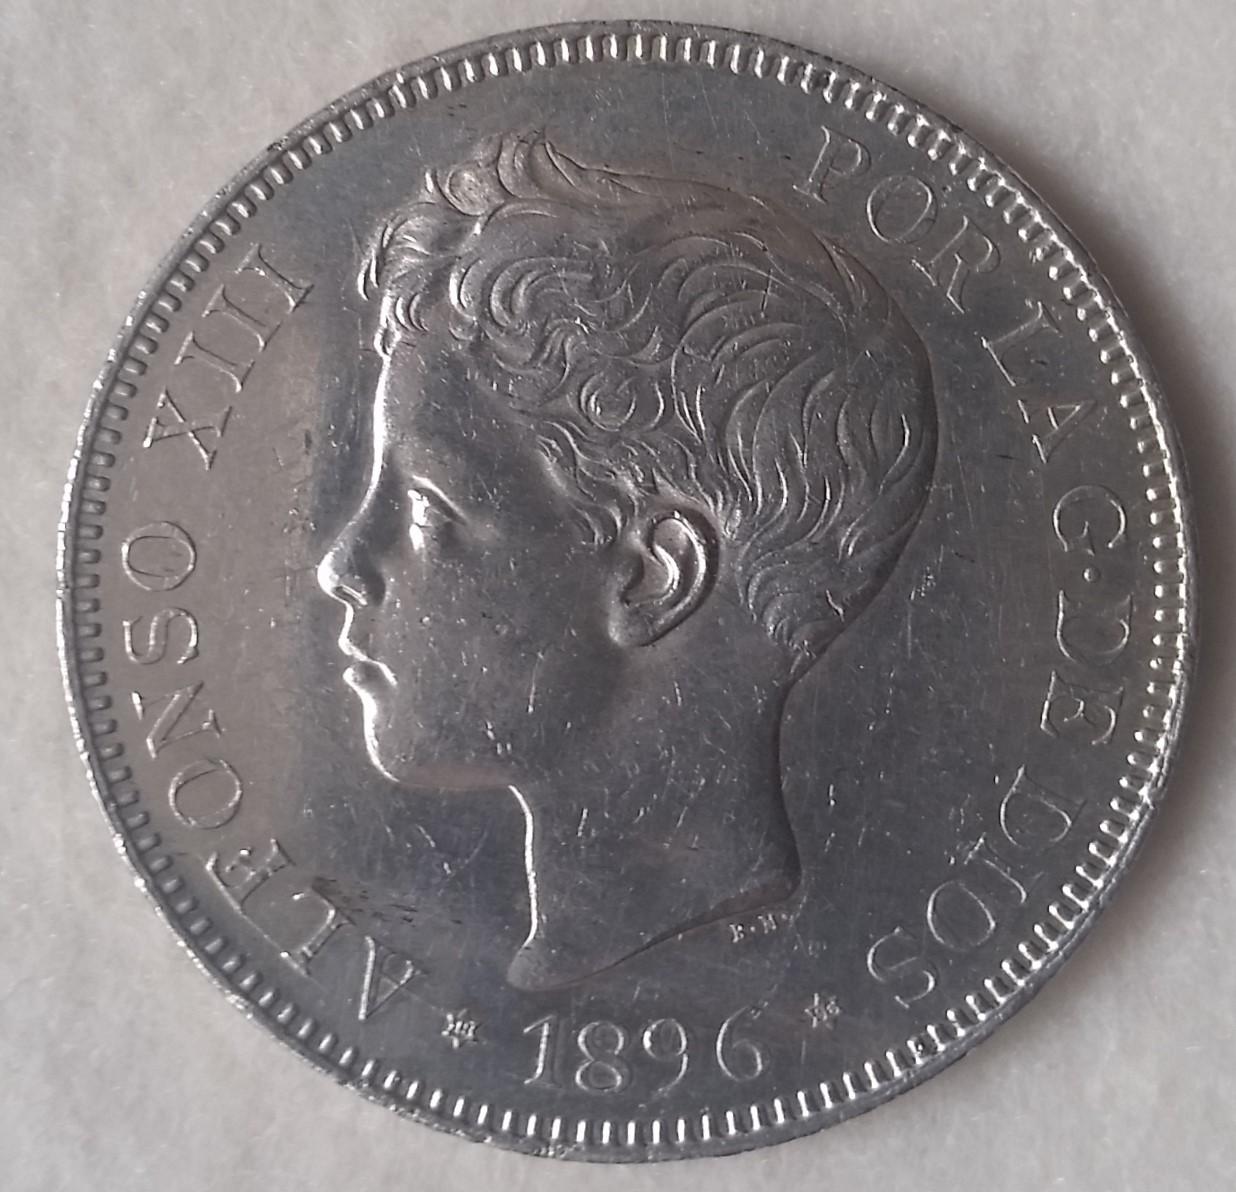 ALFONSO XIII. 5 pesetas. 1896*18-96. PGV 20160402_180024